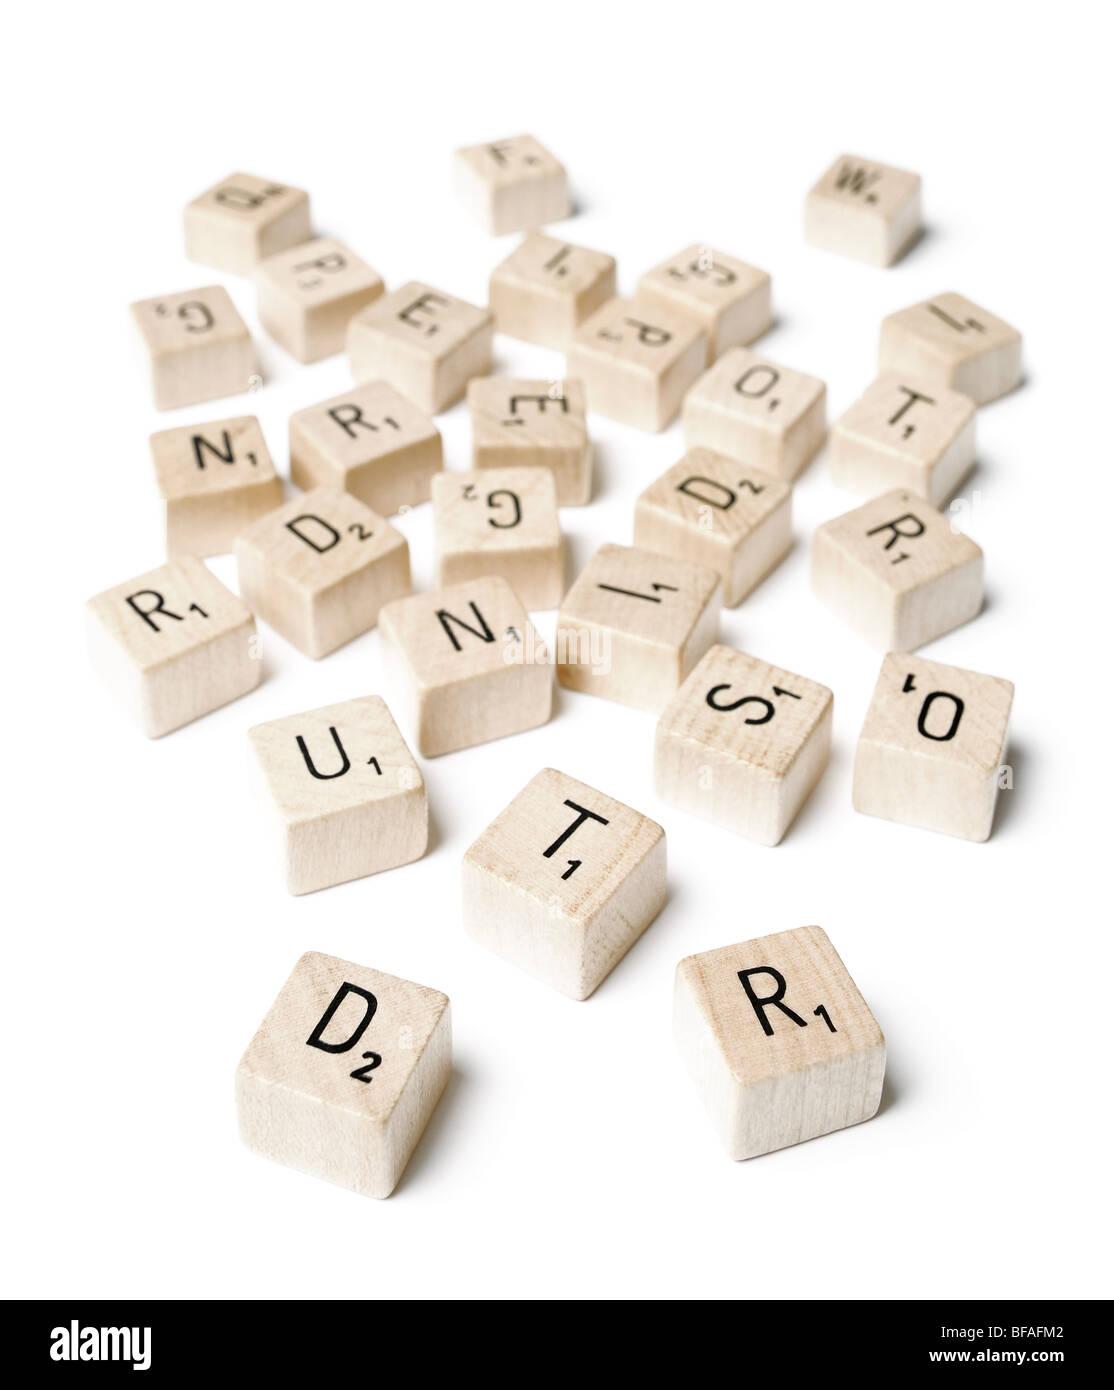 Cartas de un juego de palabras Imagen De Stock